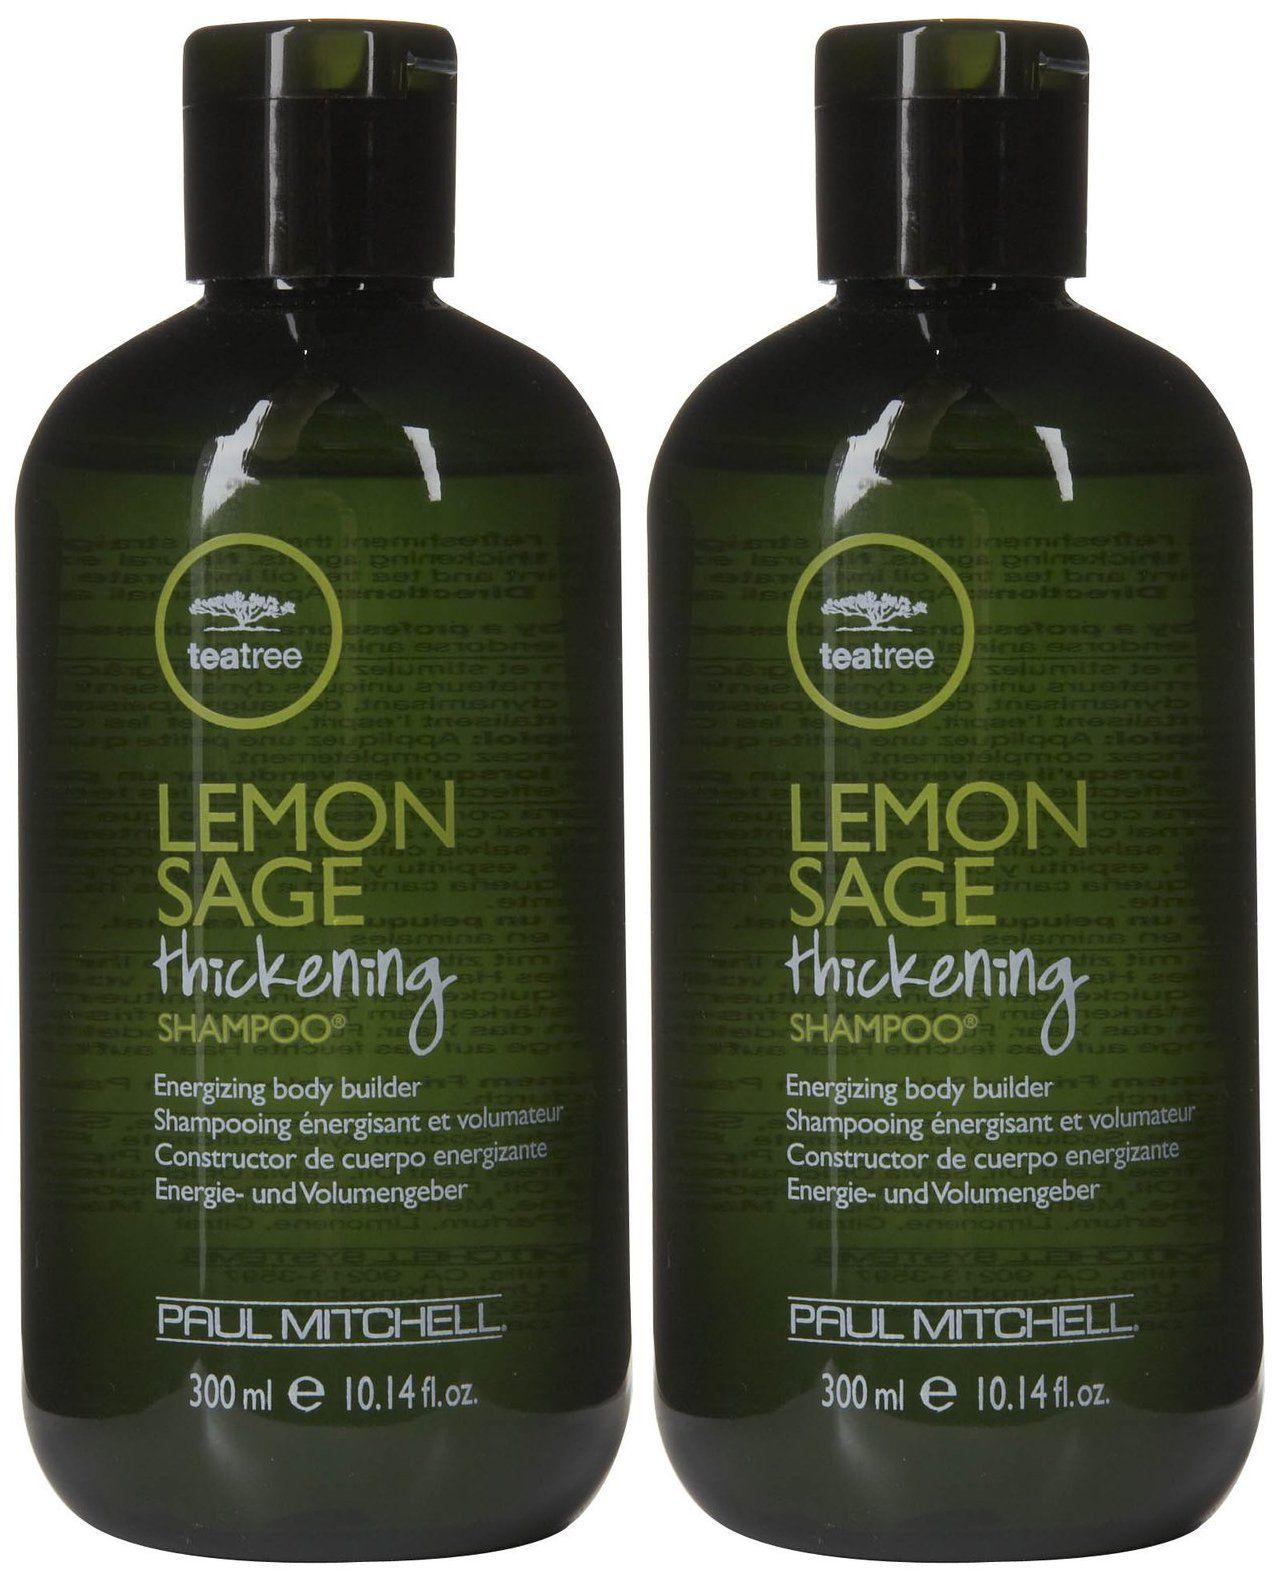 Paul Mitchell Thickening Shampoo - 10.14 oz | Shampoos, Paul ...